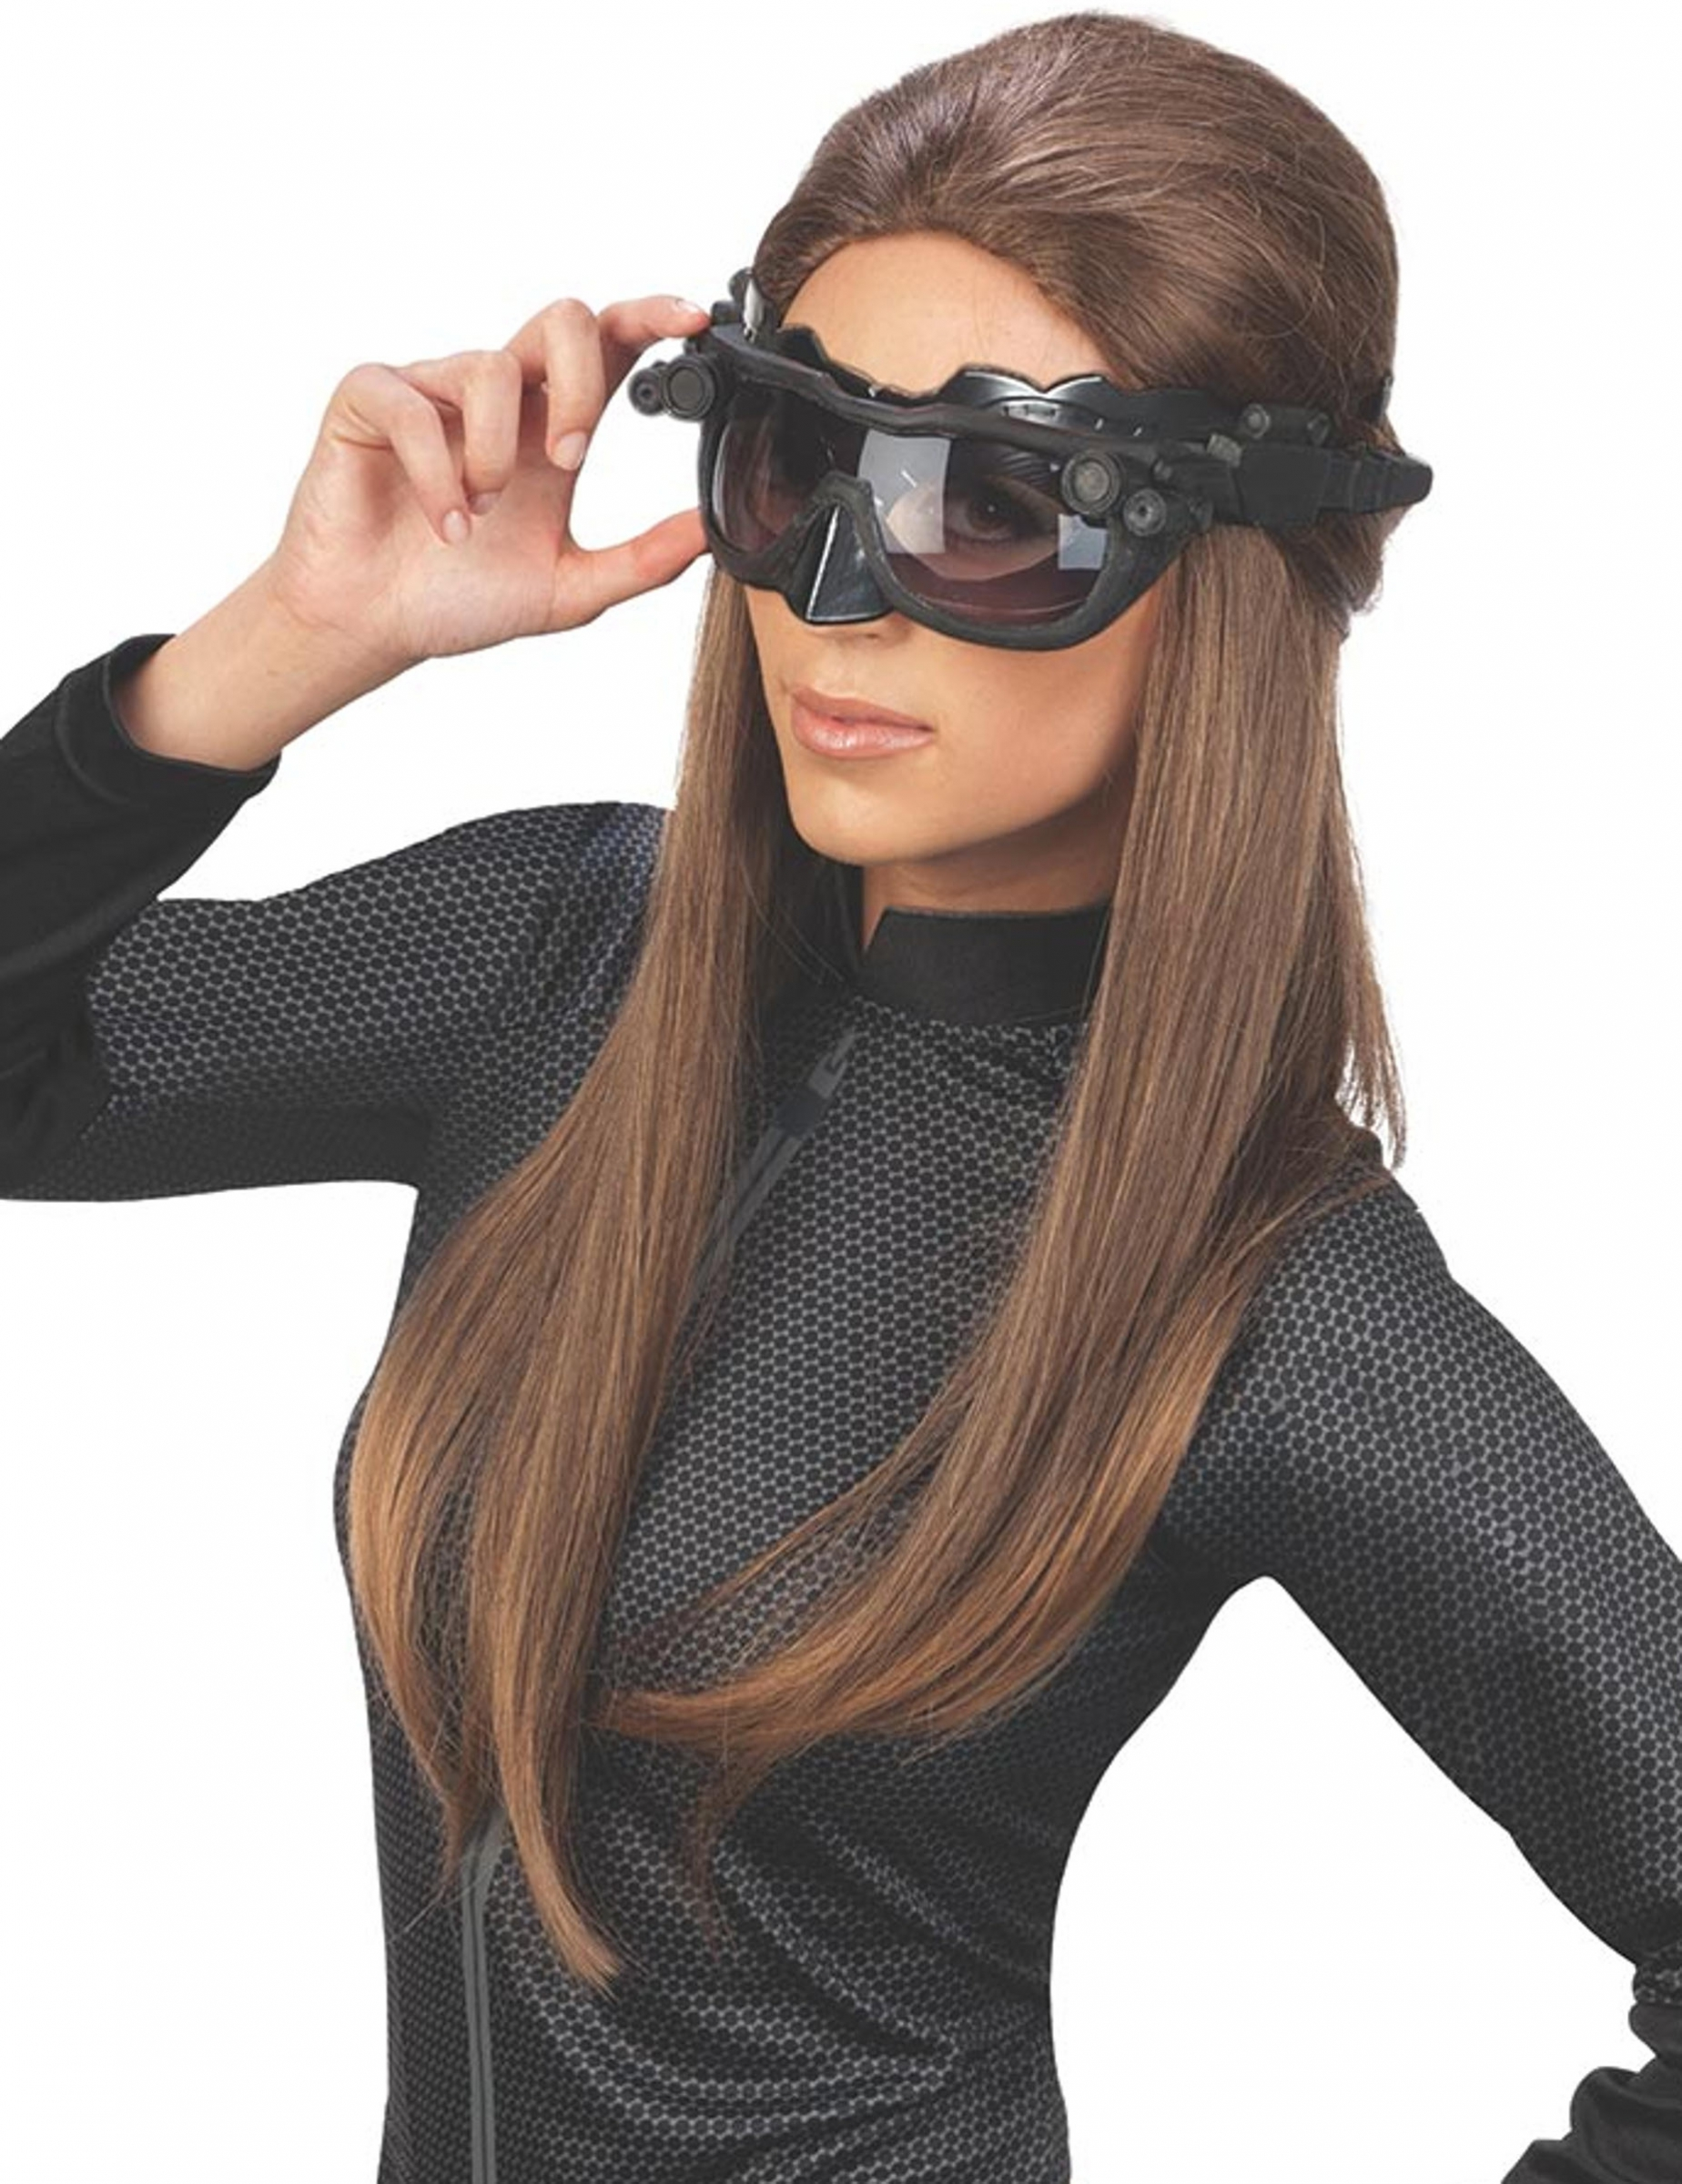 hochwertige catwoman halb maske f r erwachsene. Black Bedroom Furniture Sets. Home Design Ideas